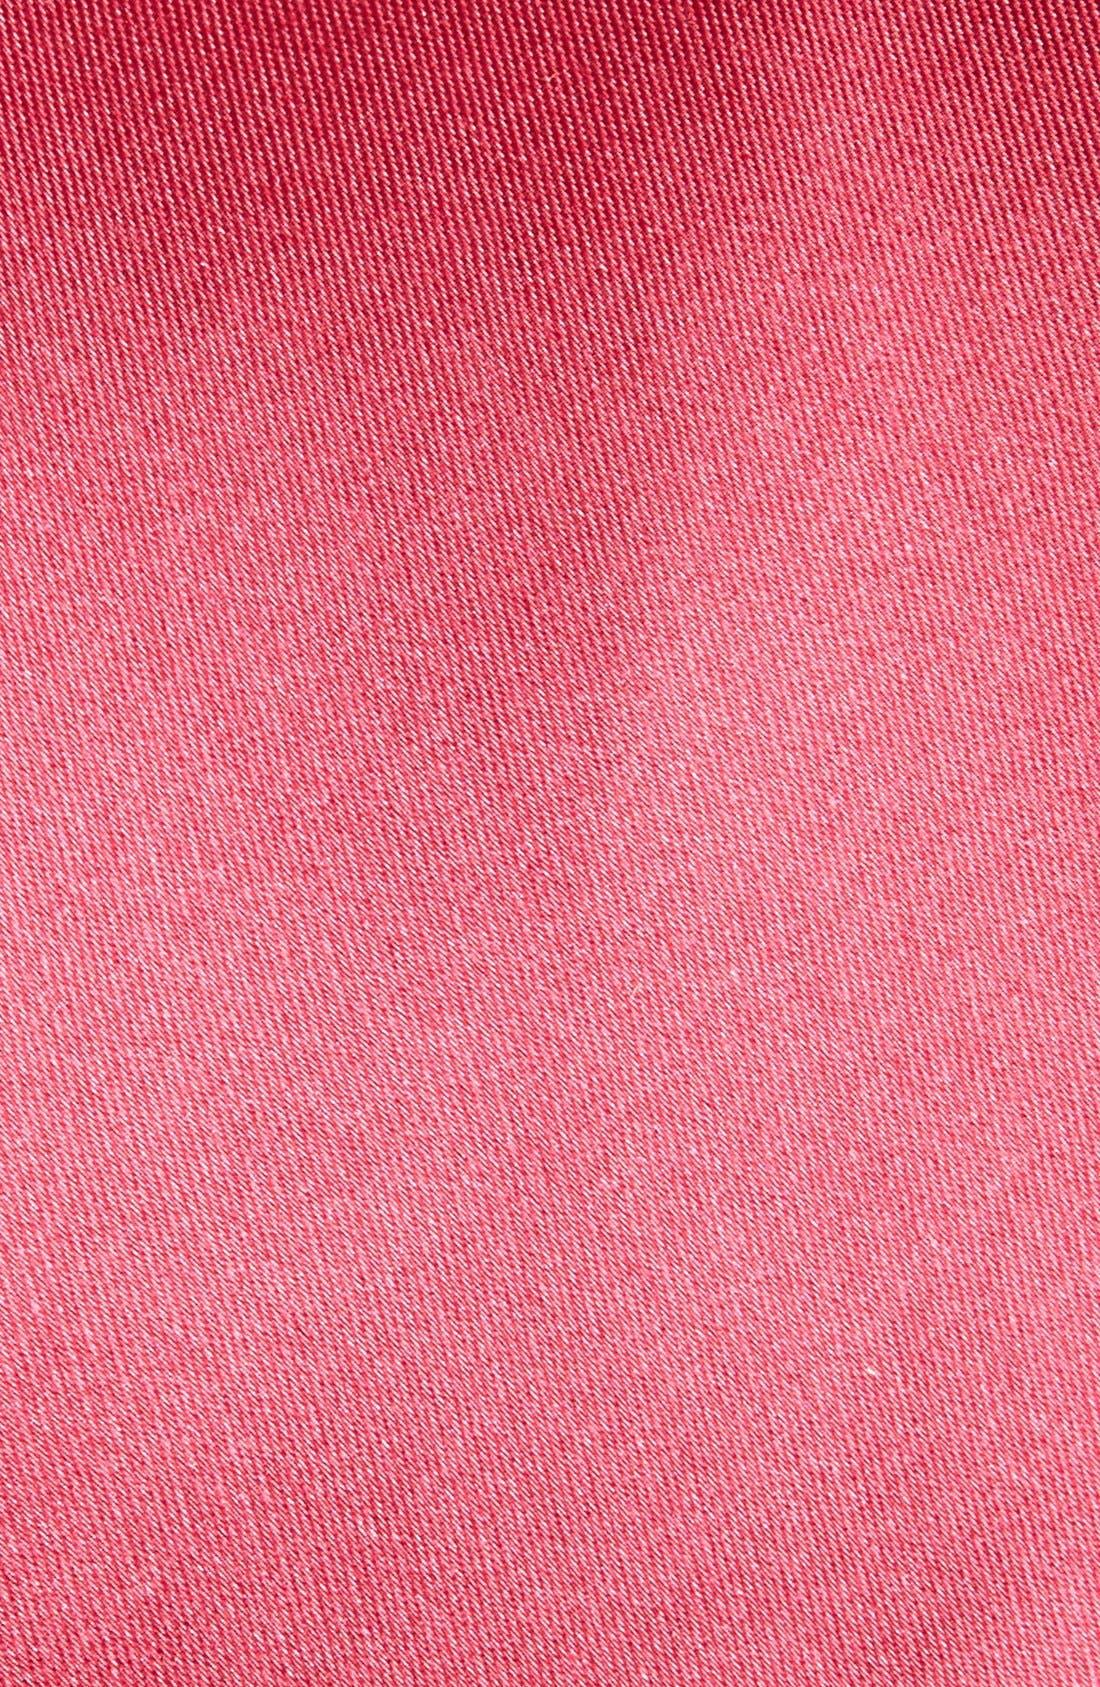 Alternate Image 2  - Nordstrom Men's Shop Solid Satin Silk Tie (X-Long)